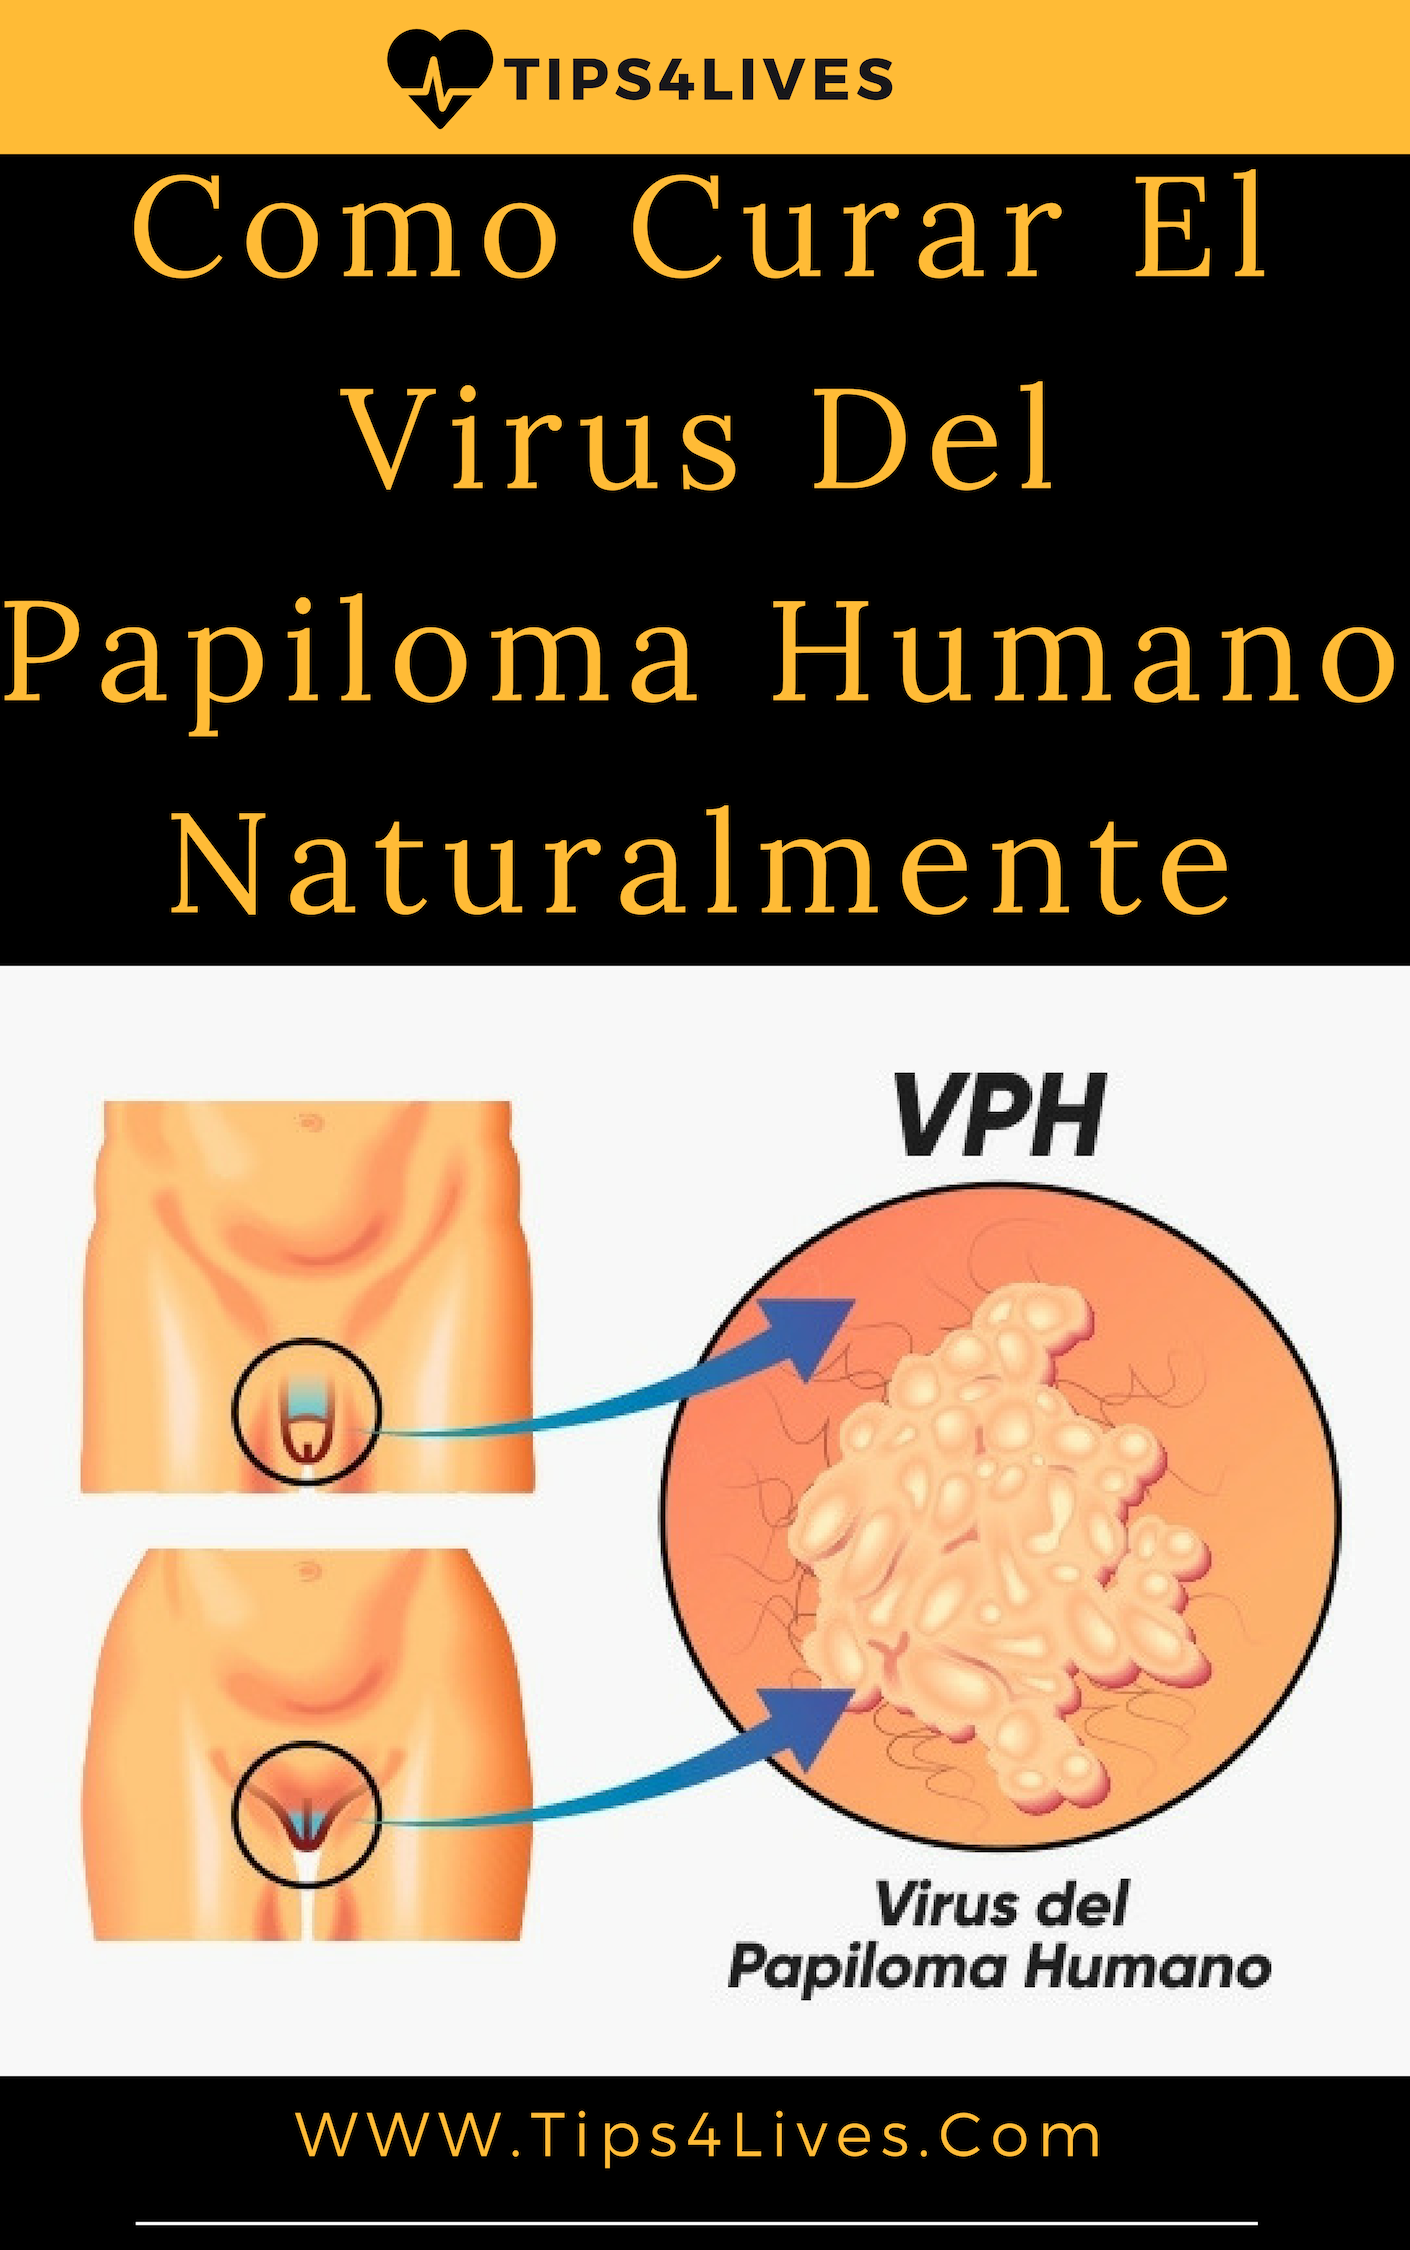 sintomas del virus papiloma humano warts mouth pictures